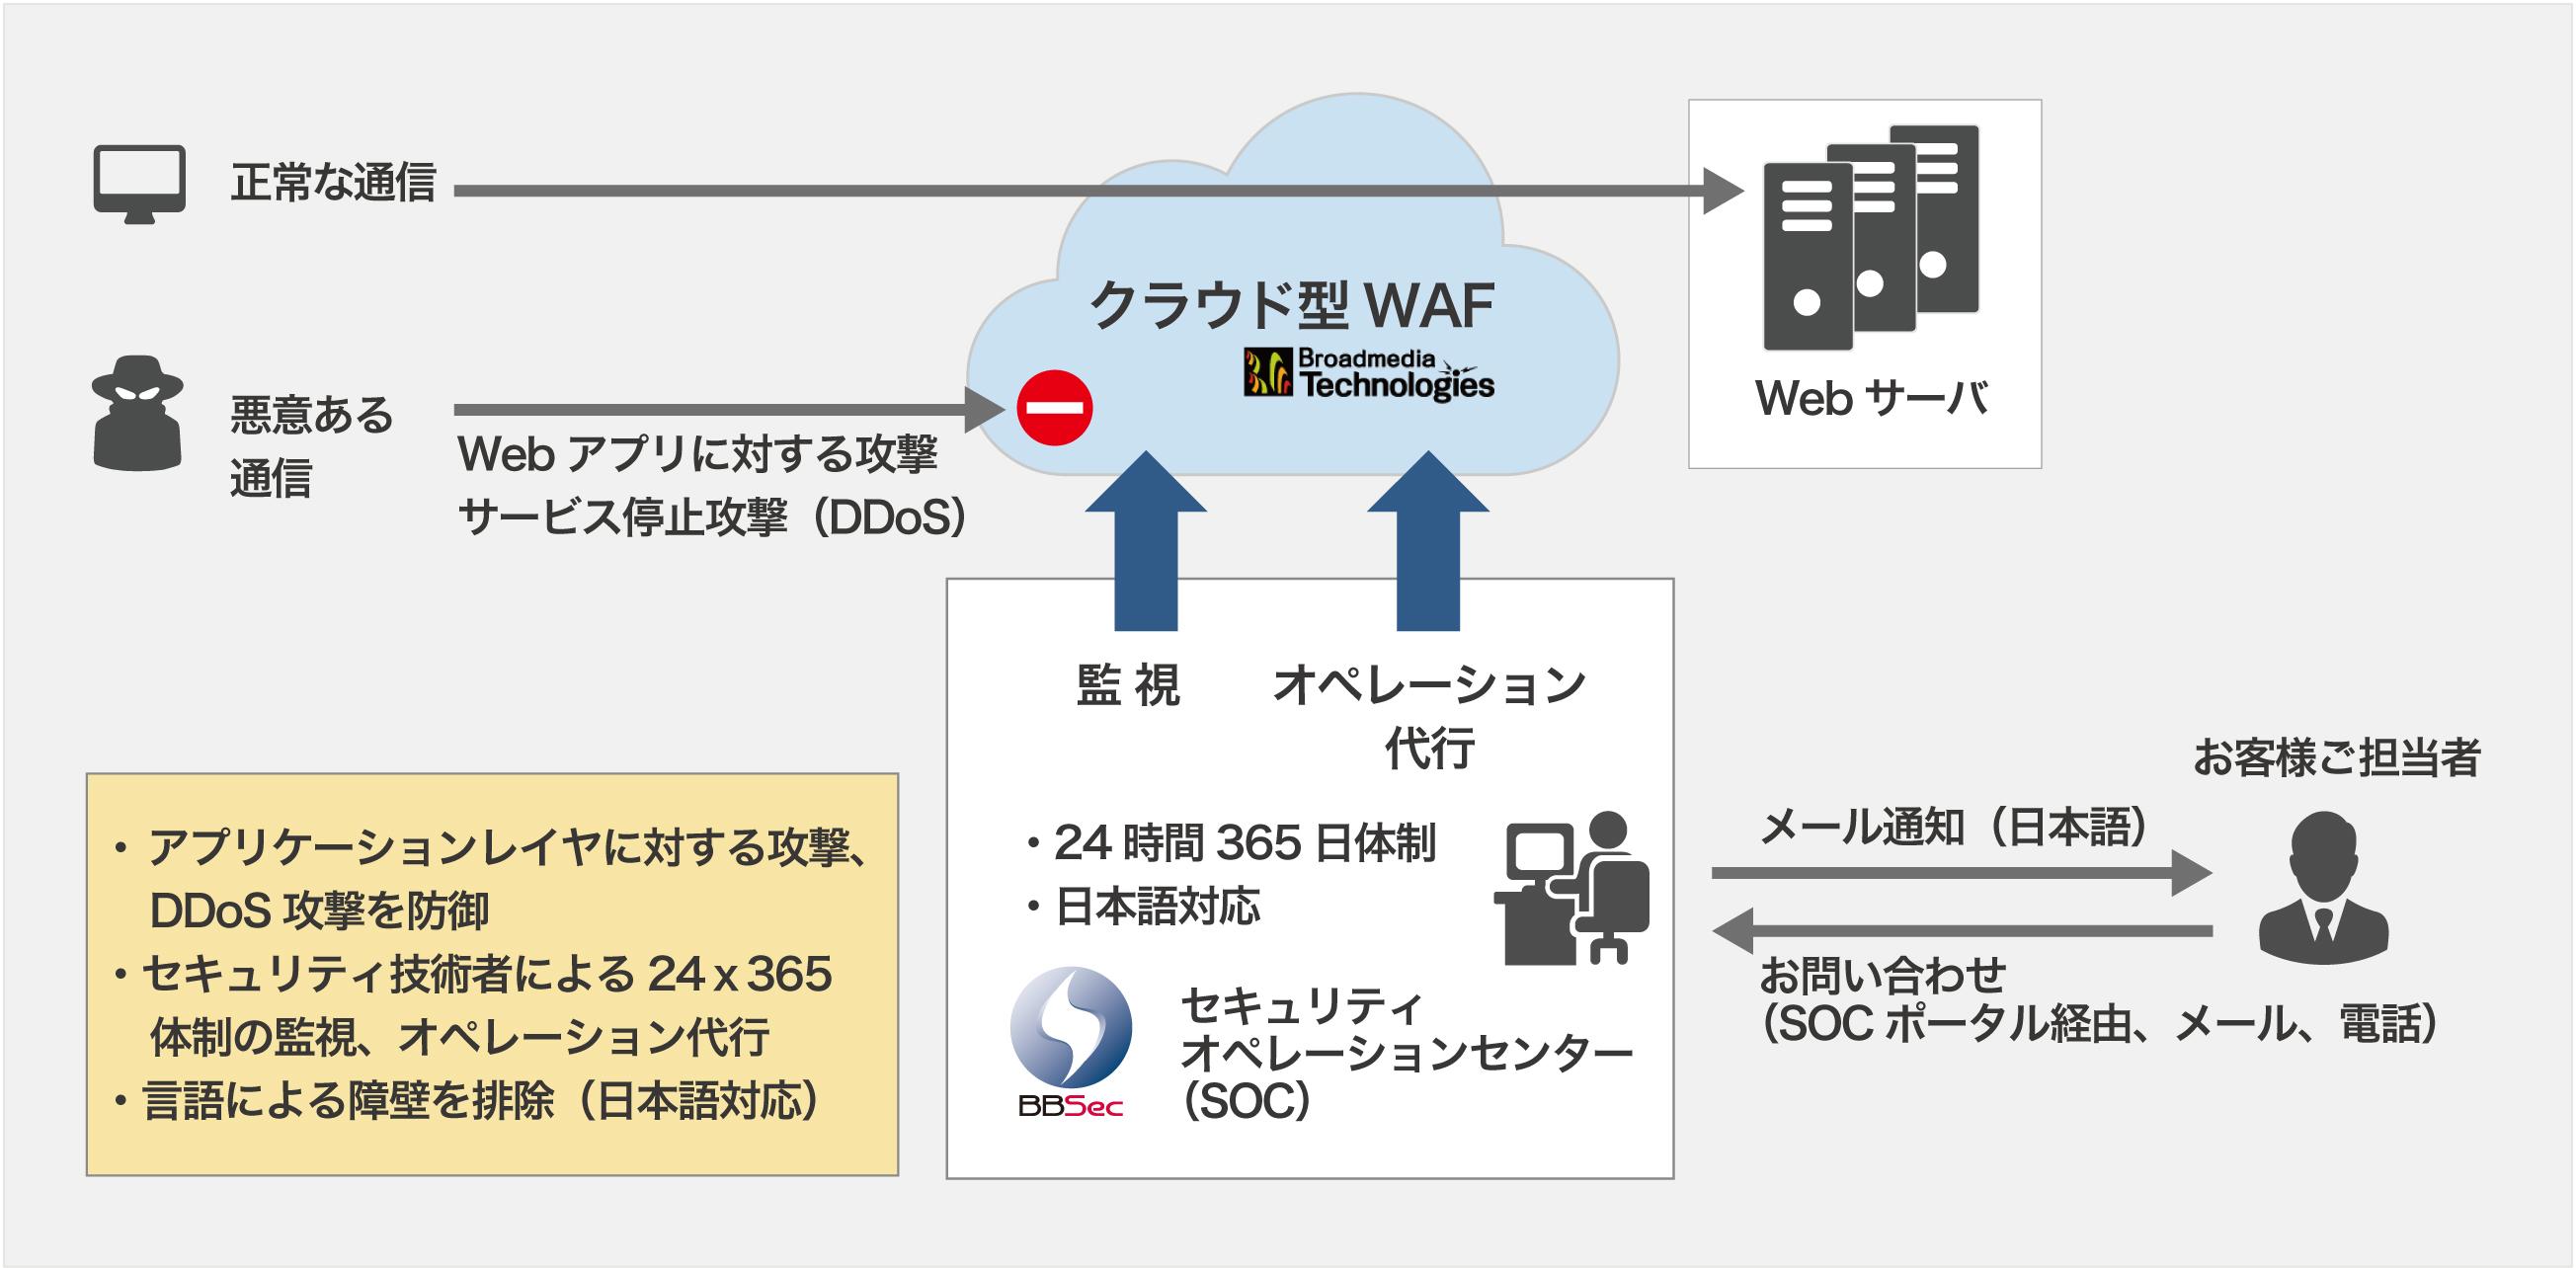 BBSec、クラウド型WAF/DDoS対策によるサイバー攻撃防御でブロードメディア・テクノロジーズと協業